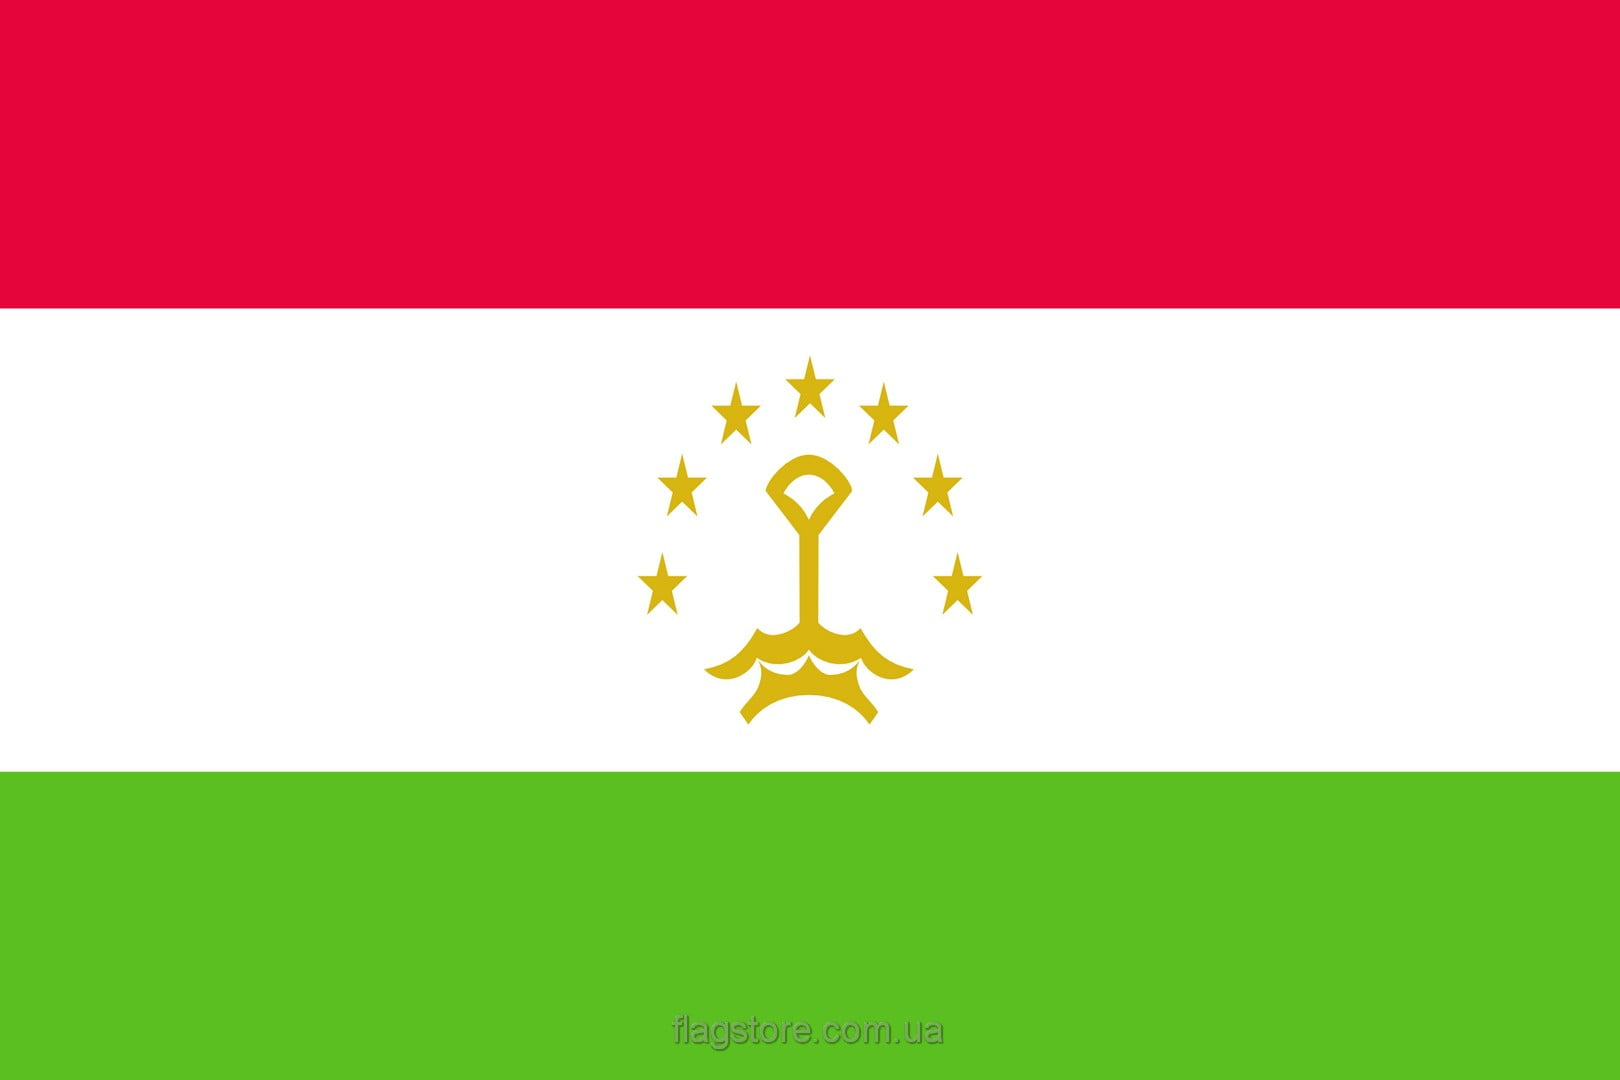 Купить флаг Таджикистана (страны Таджикистан)